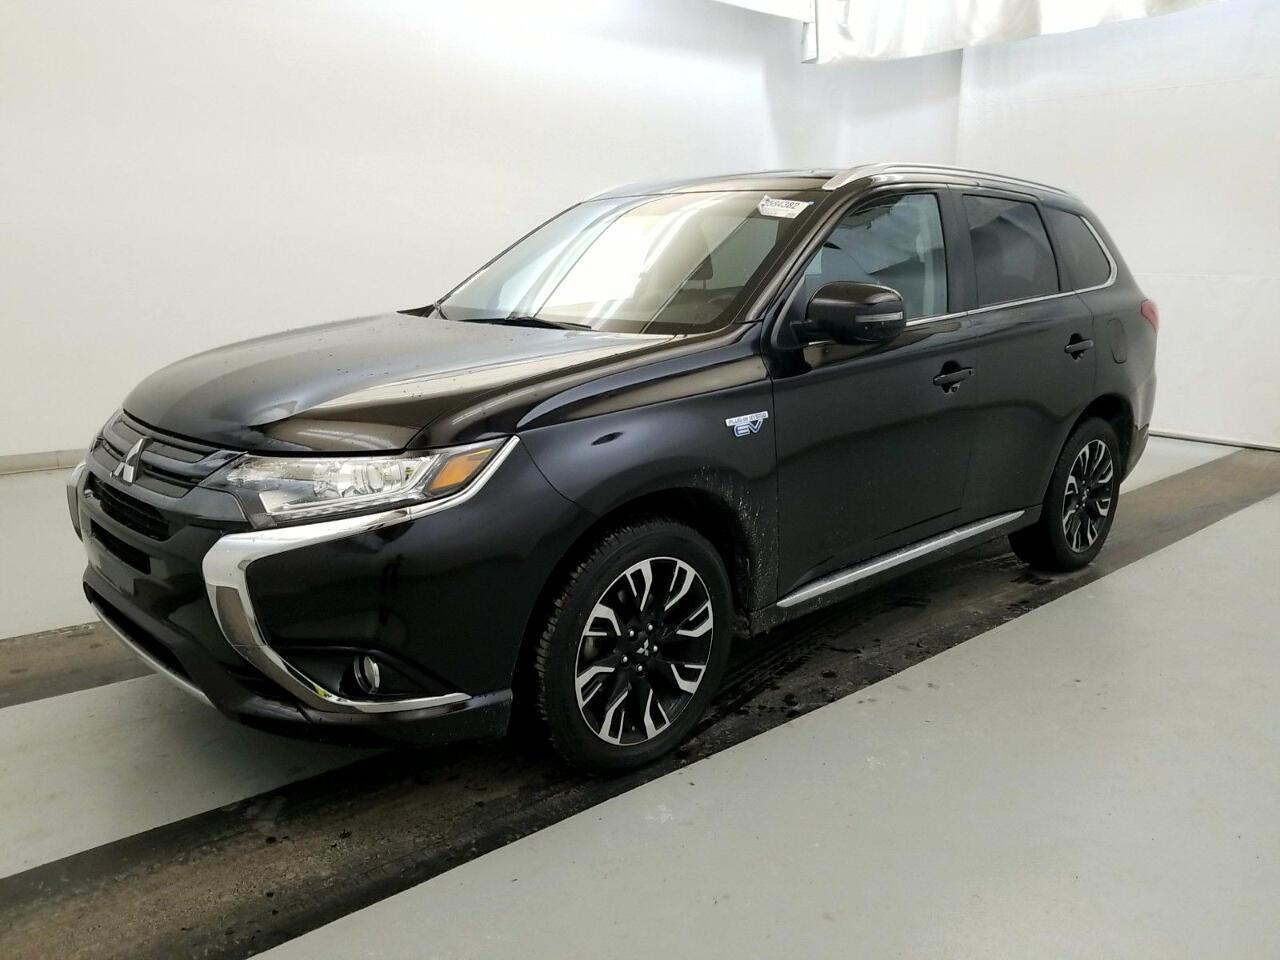 Mitsubishi Outlander PHEV SEL S-AWC 2018